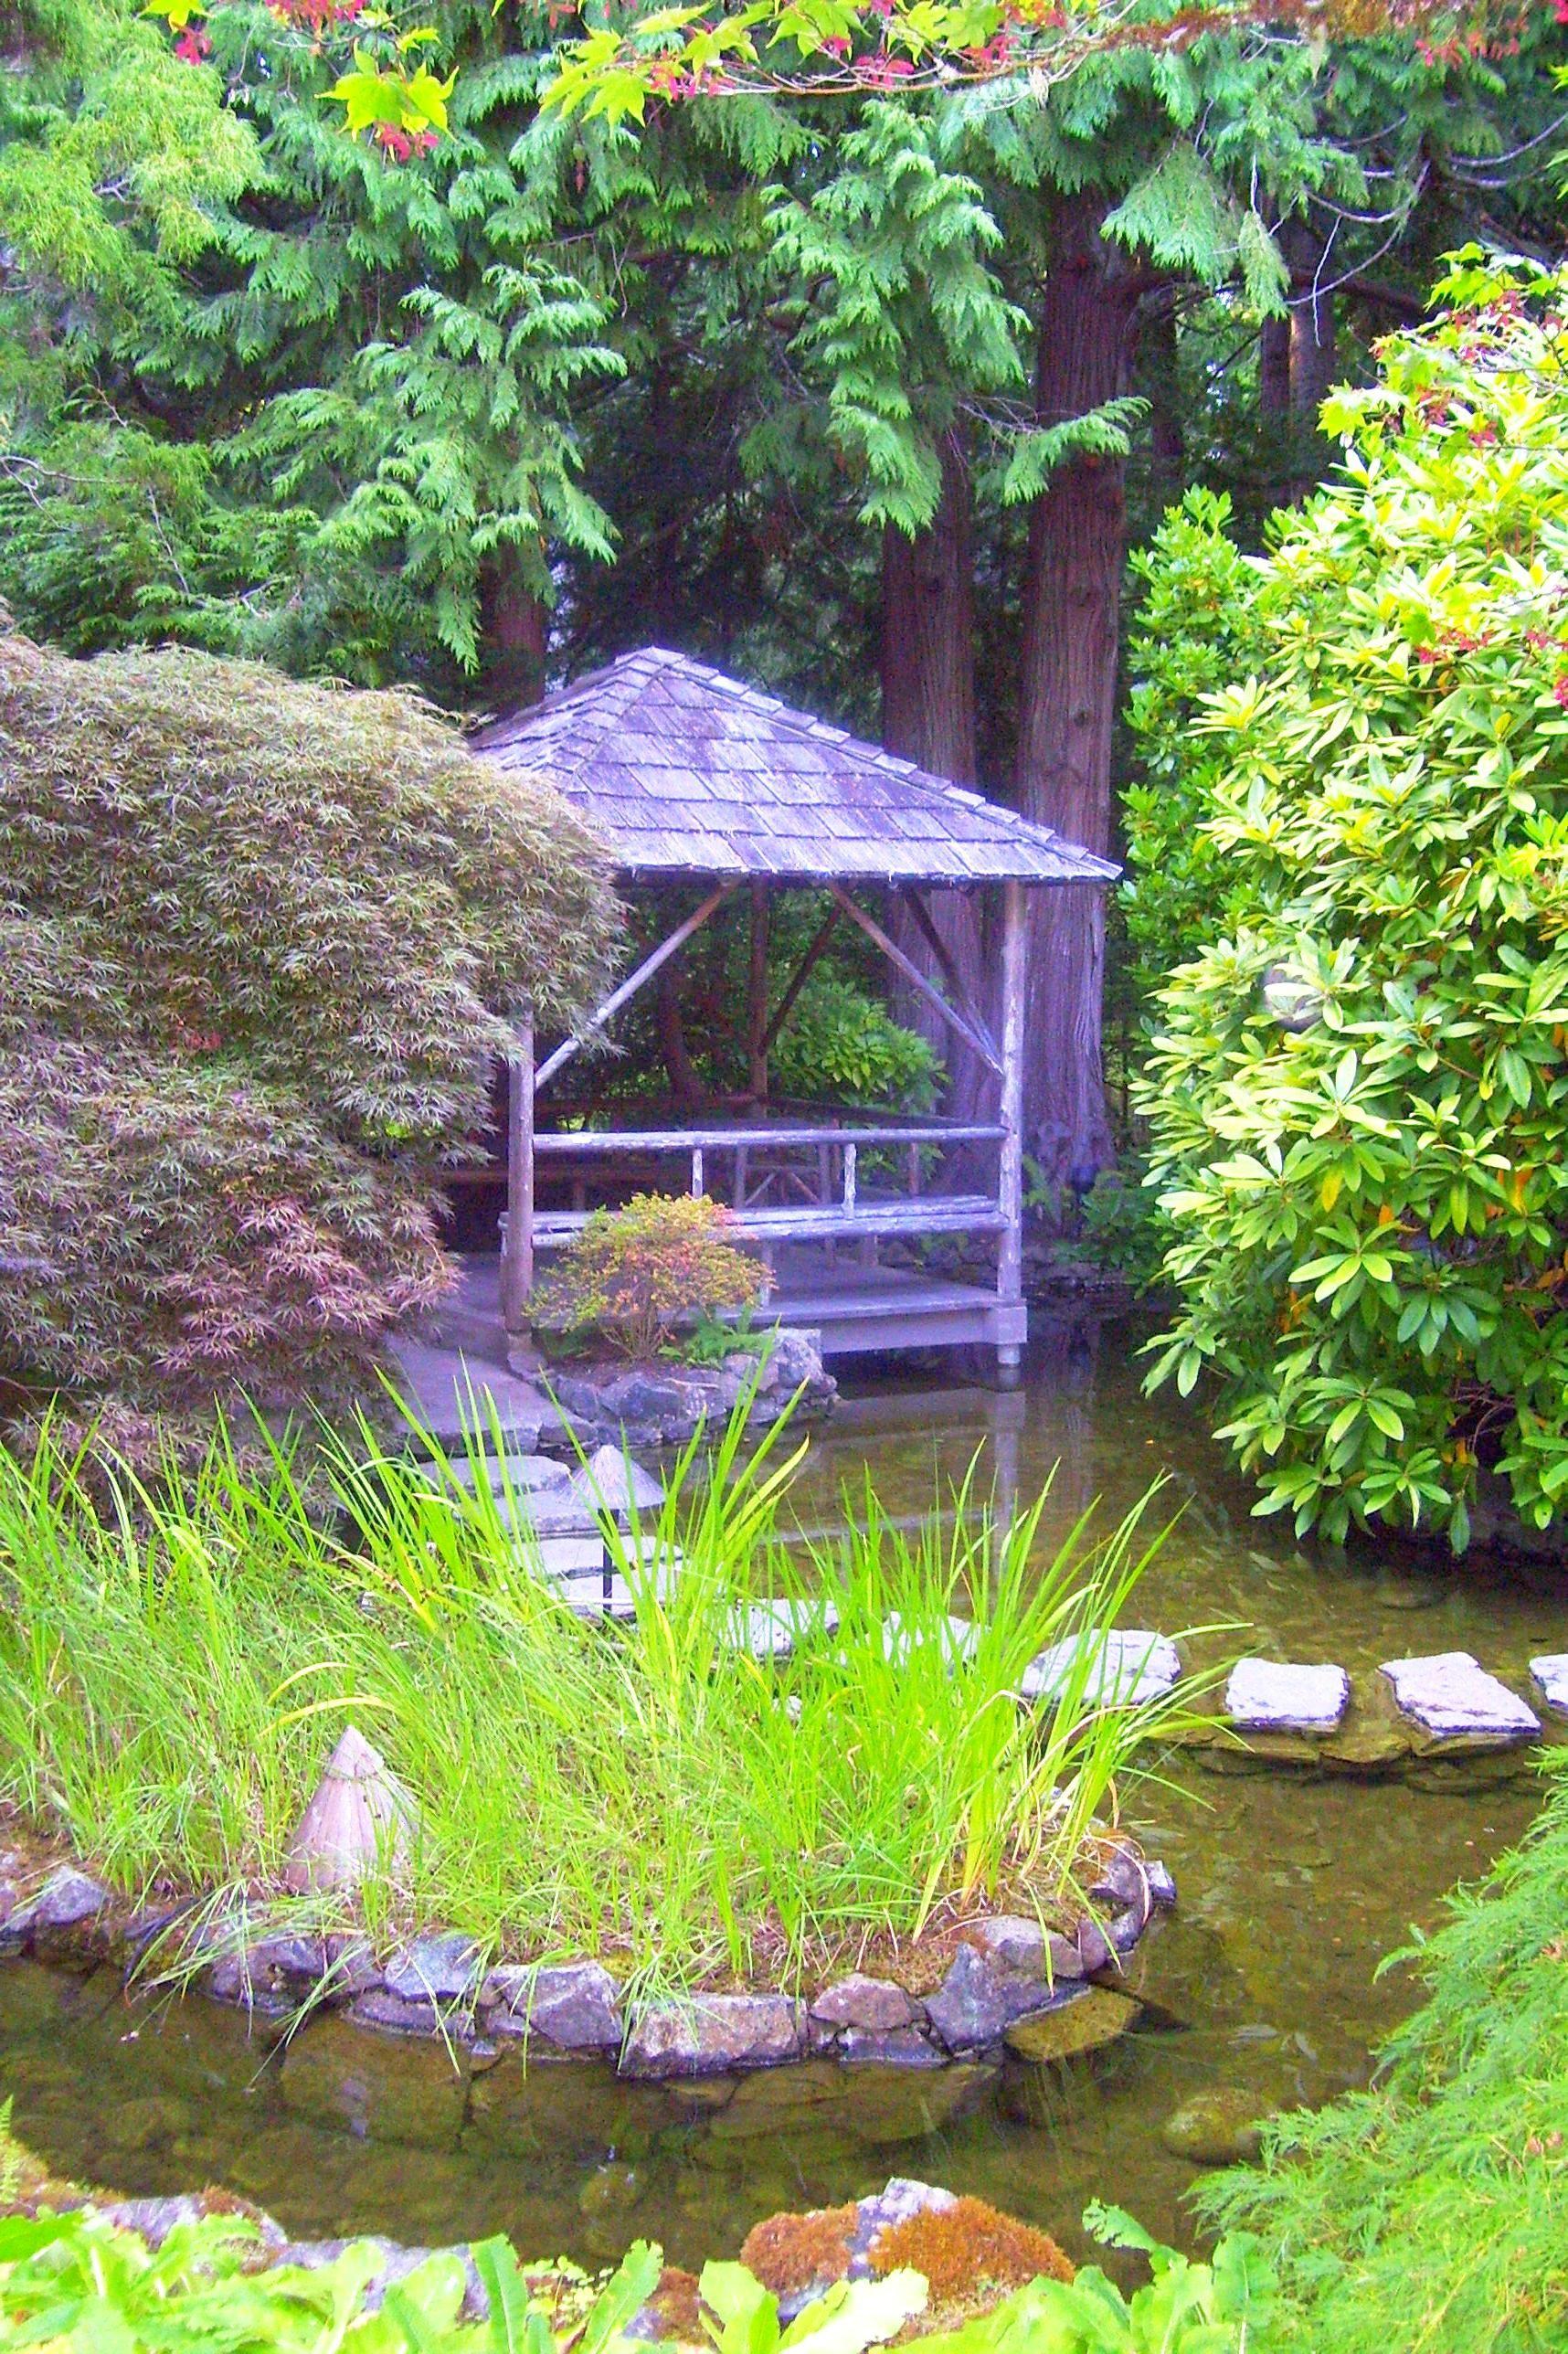 Gazebo in the Japanese Garden at the Butchart Gardens in ...